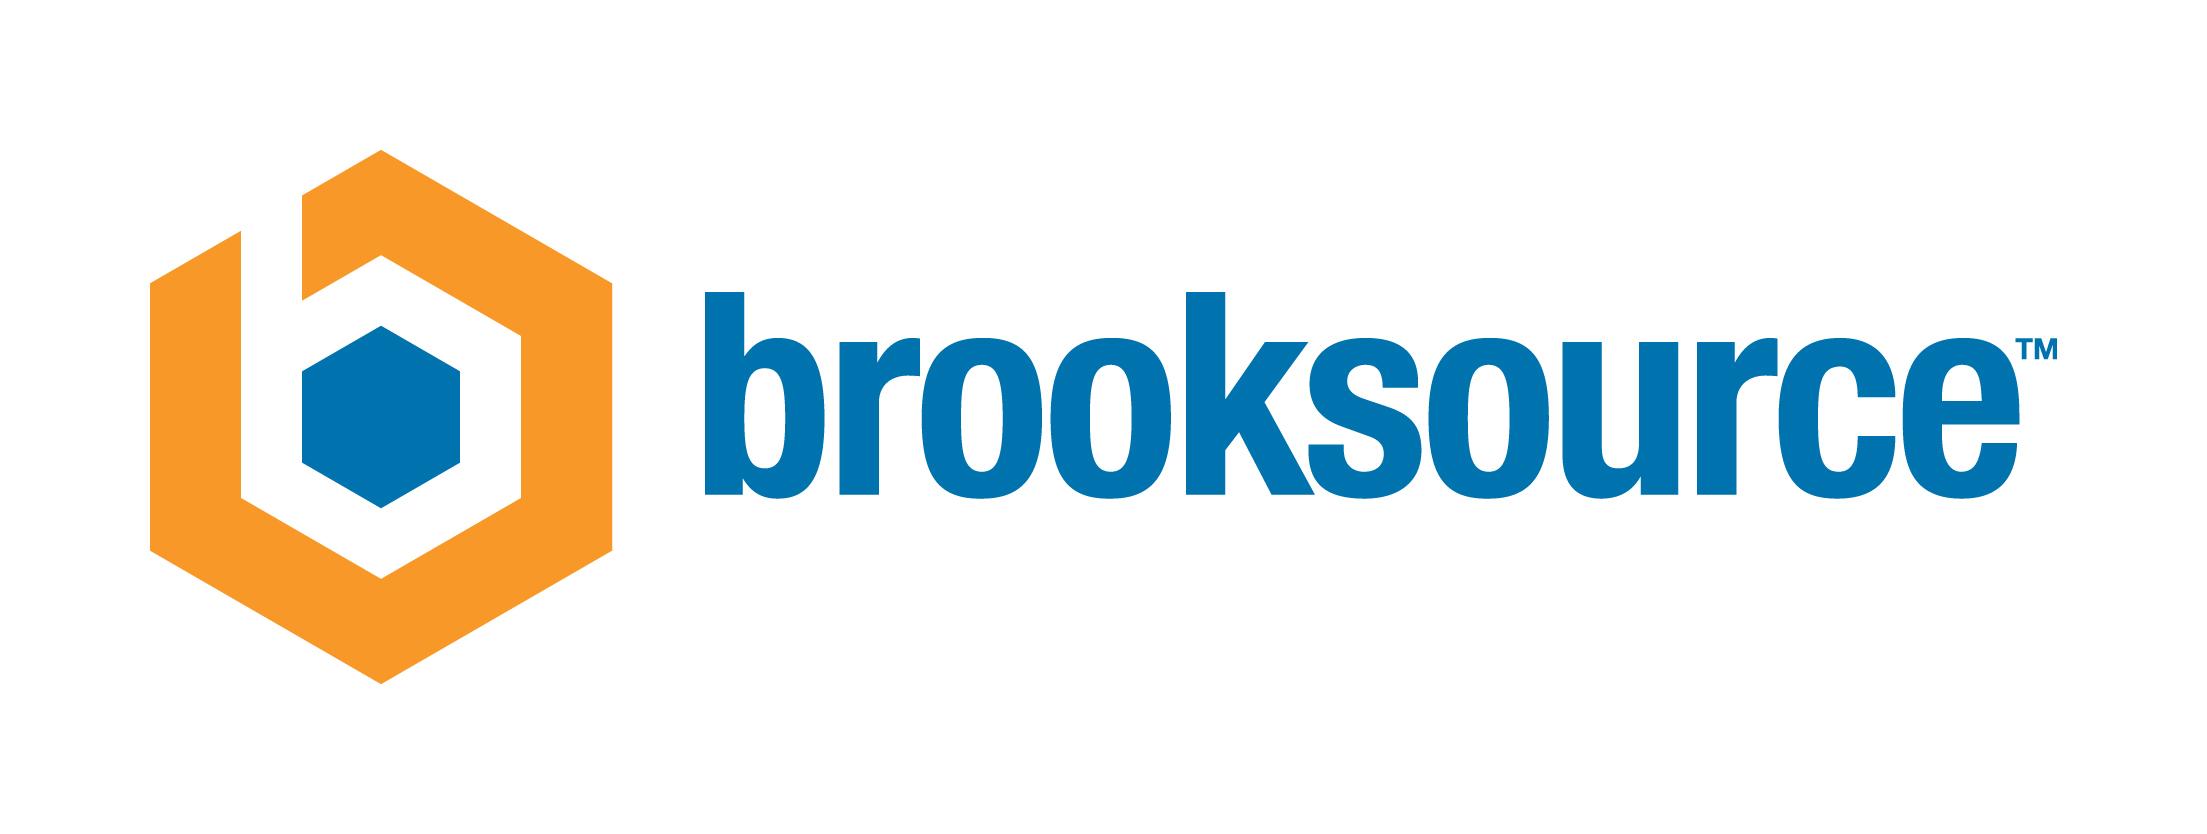 brooksource-mobile.jpg